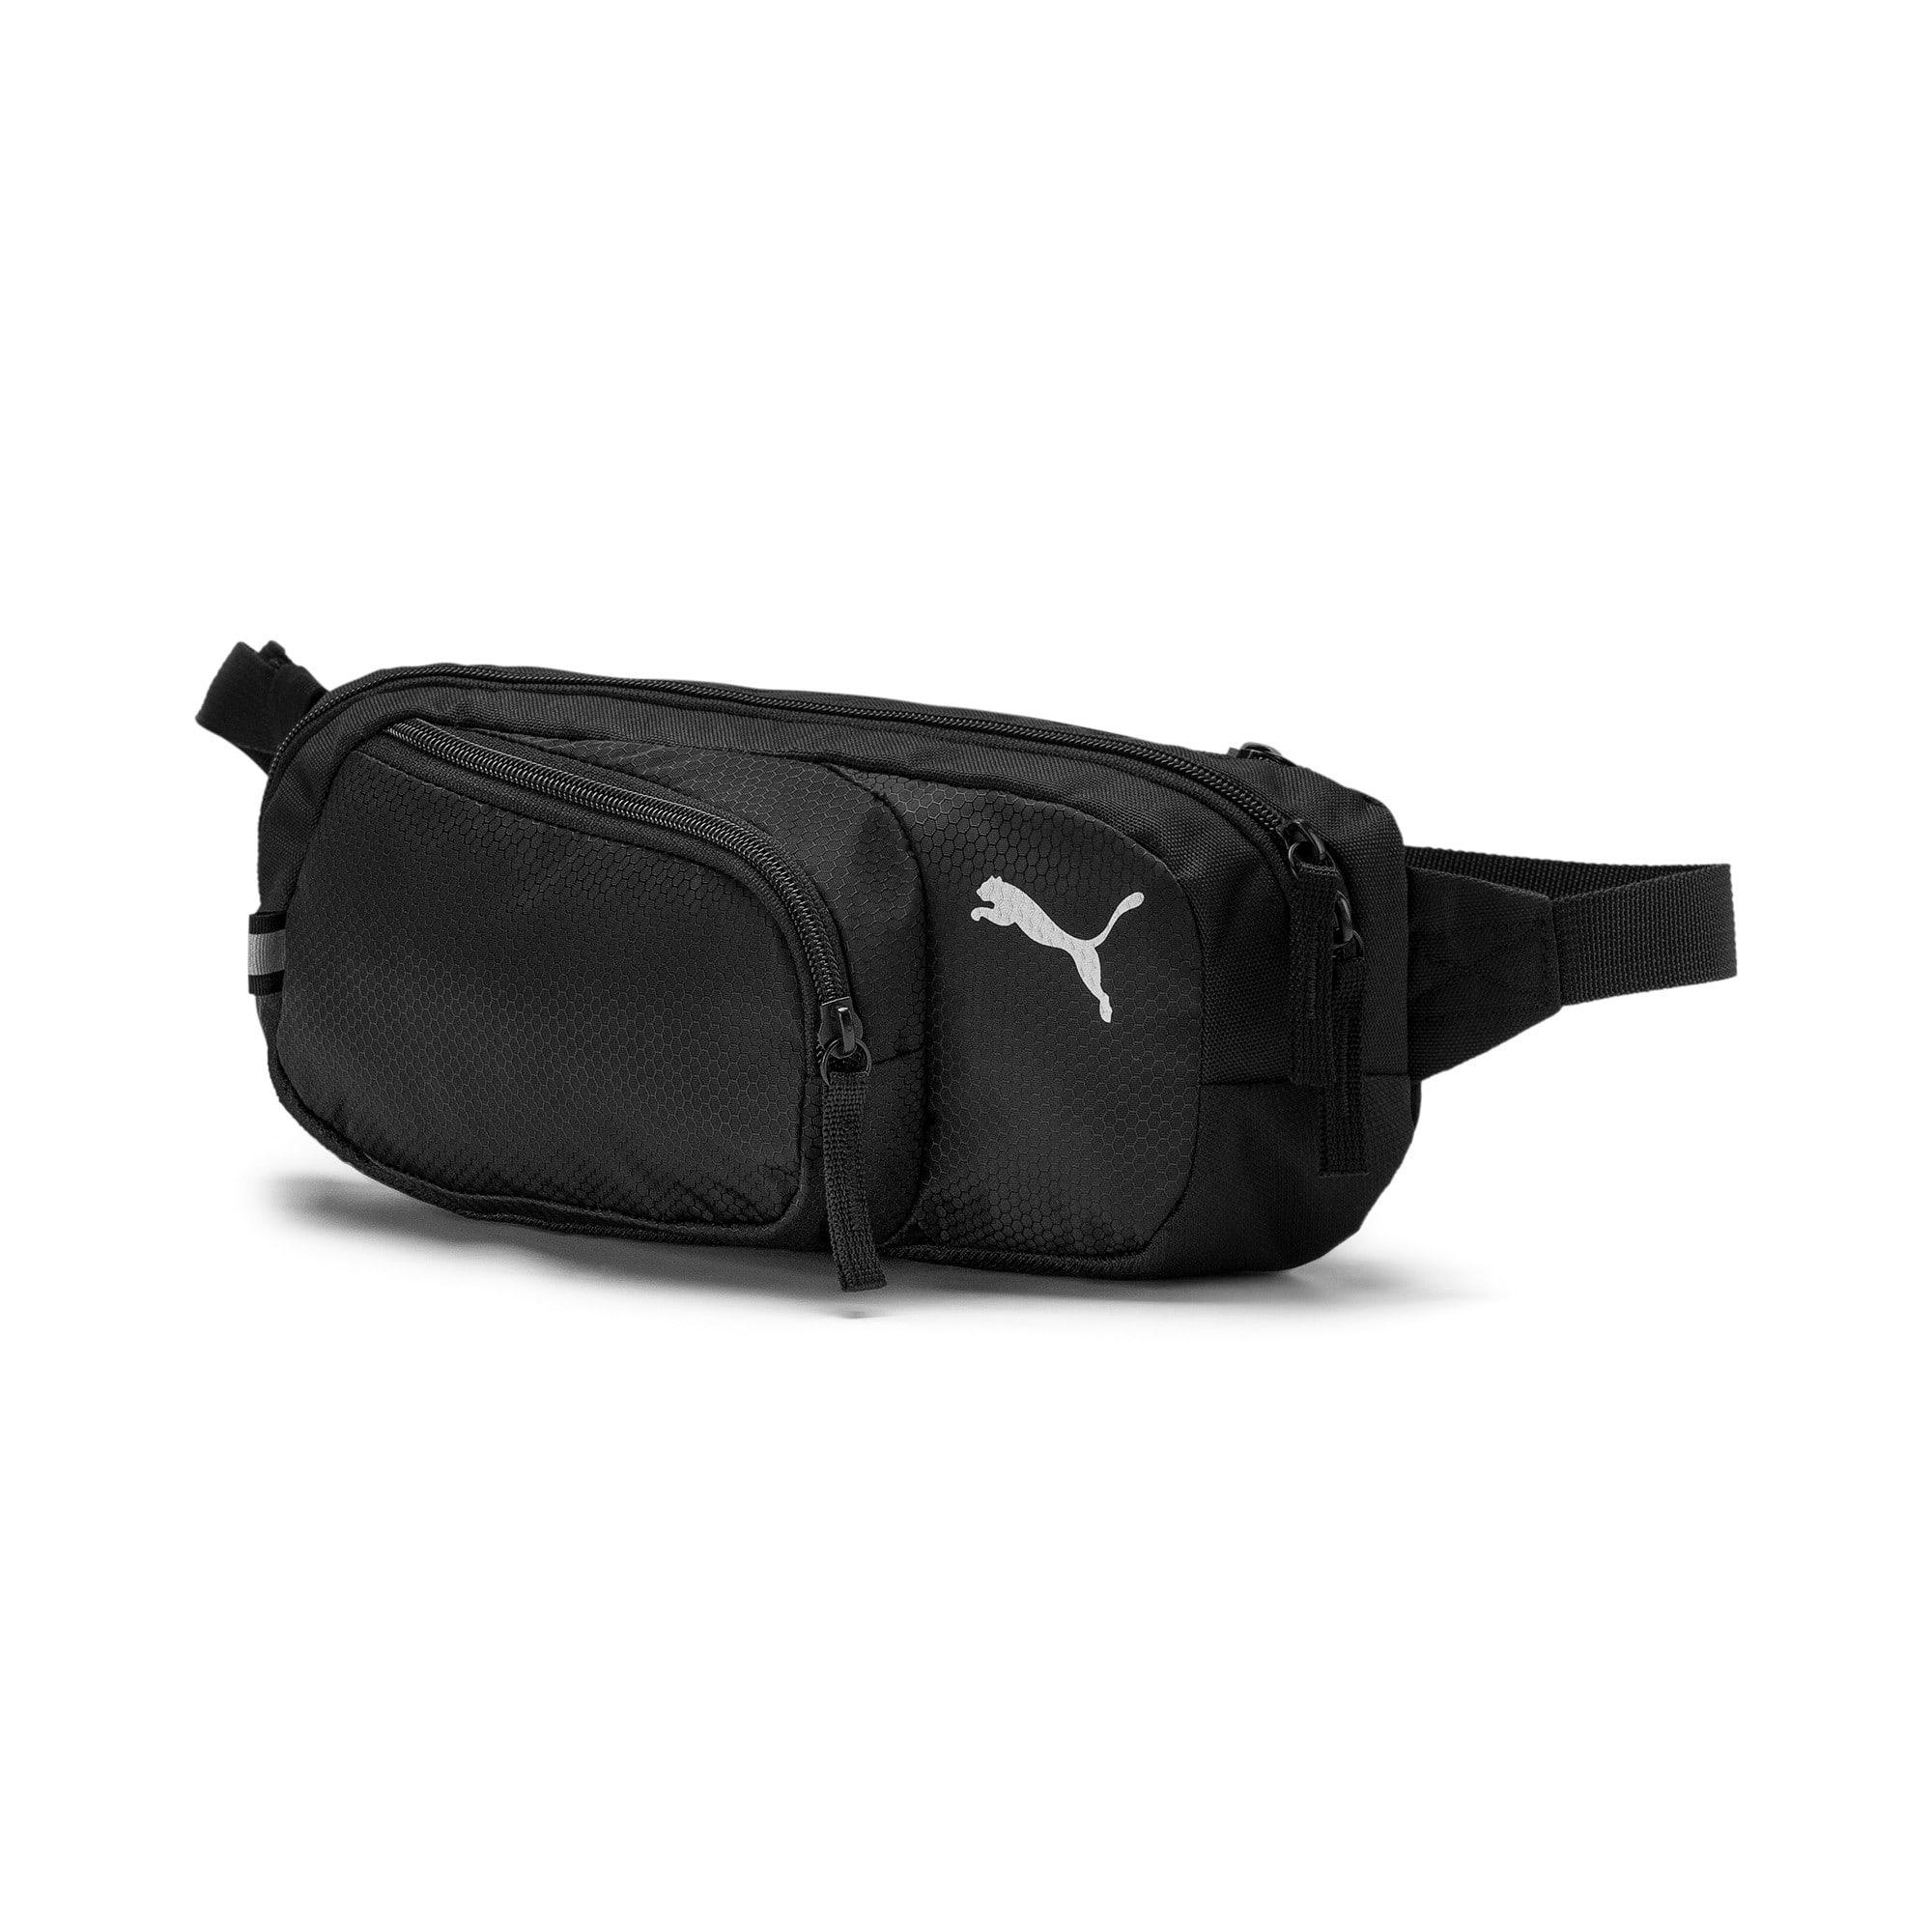 Thumbnail 1 of PUMA X Multi Waist Bag, Puma Black, medium